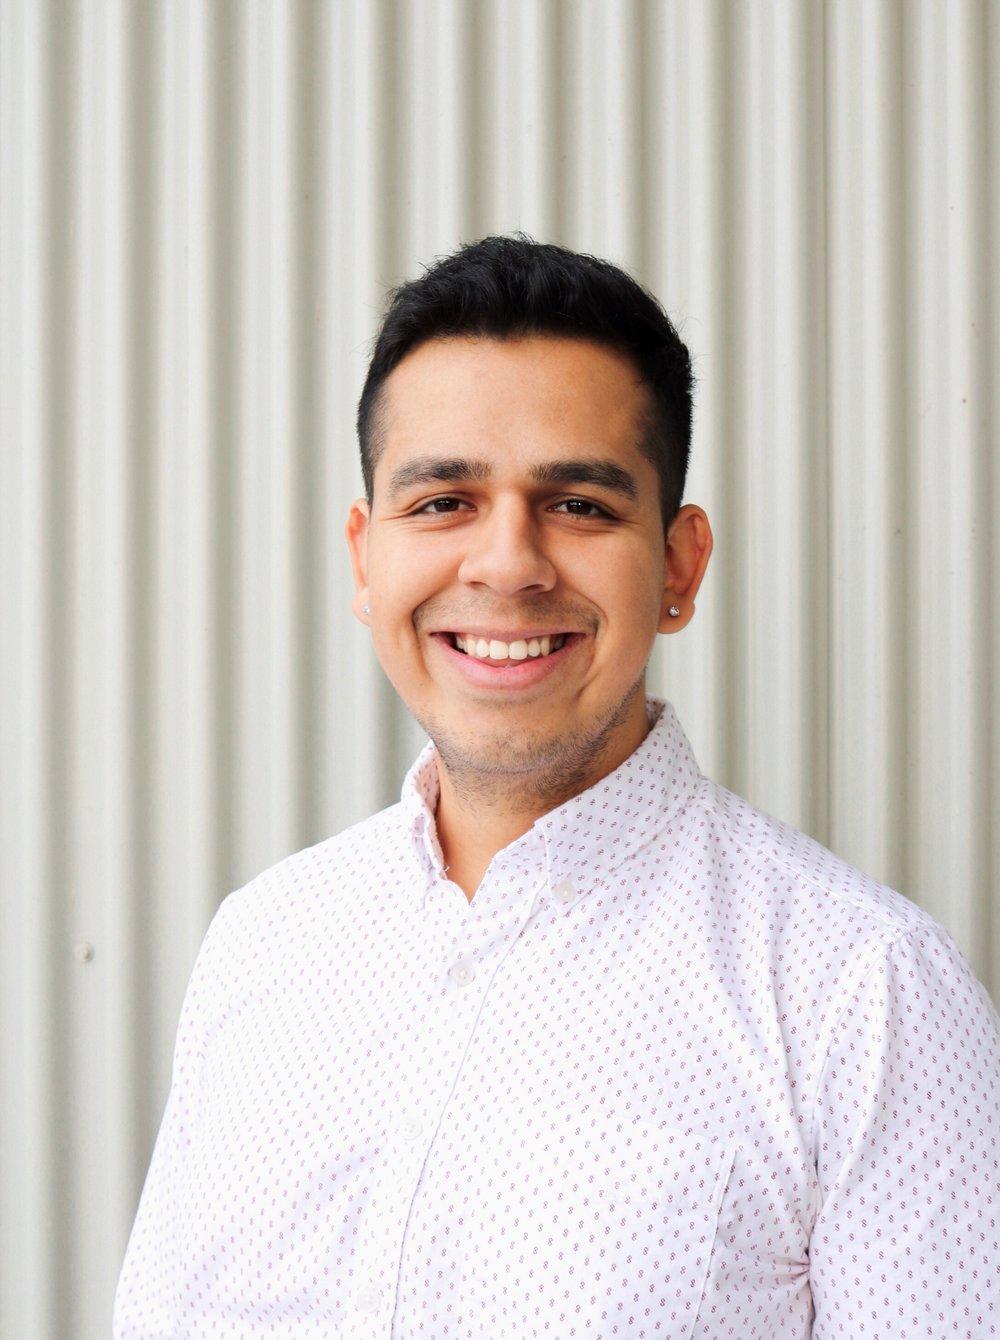 Piero Castillo - Director of Sales & Finance